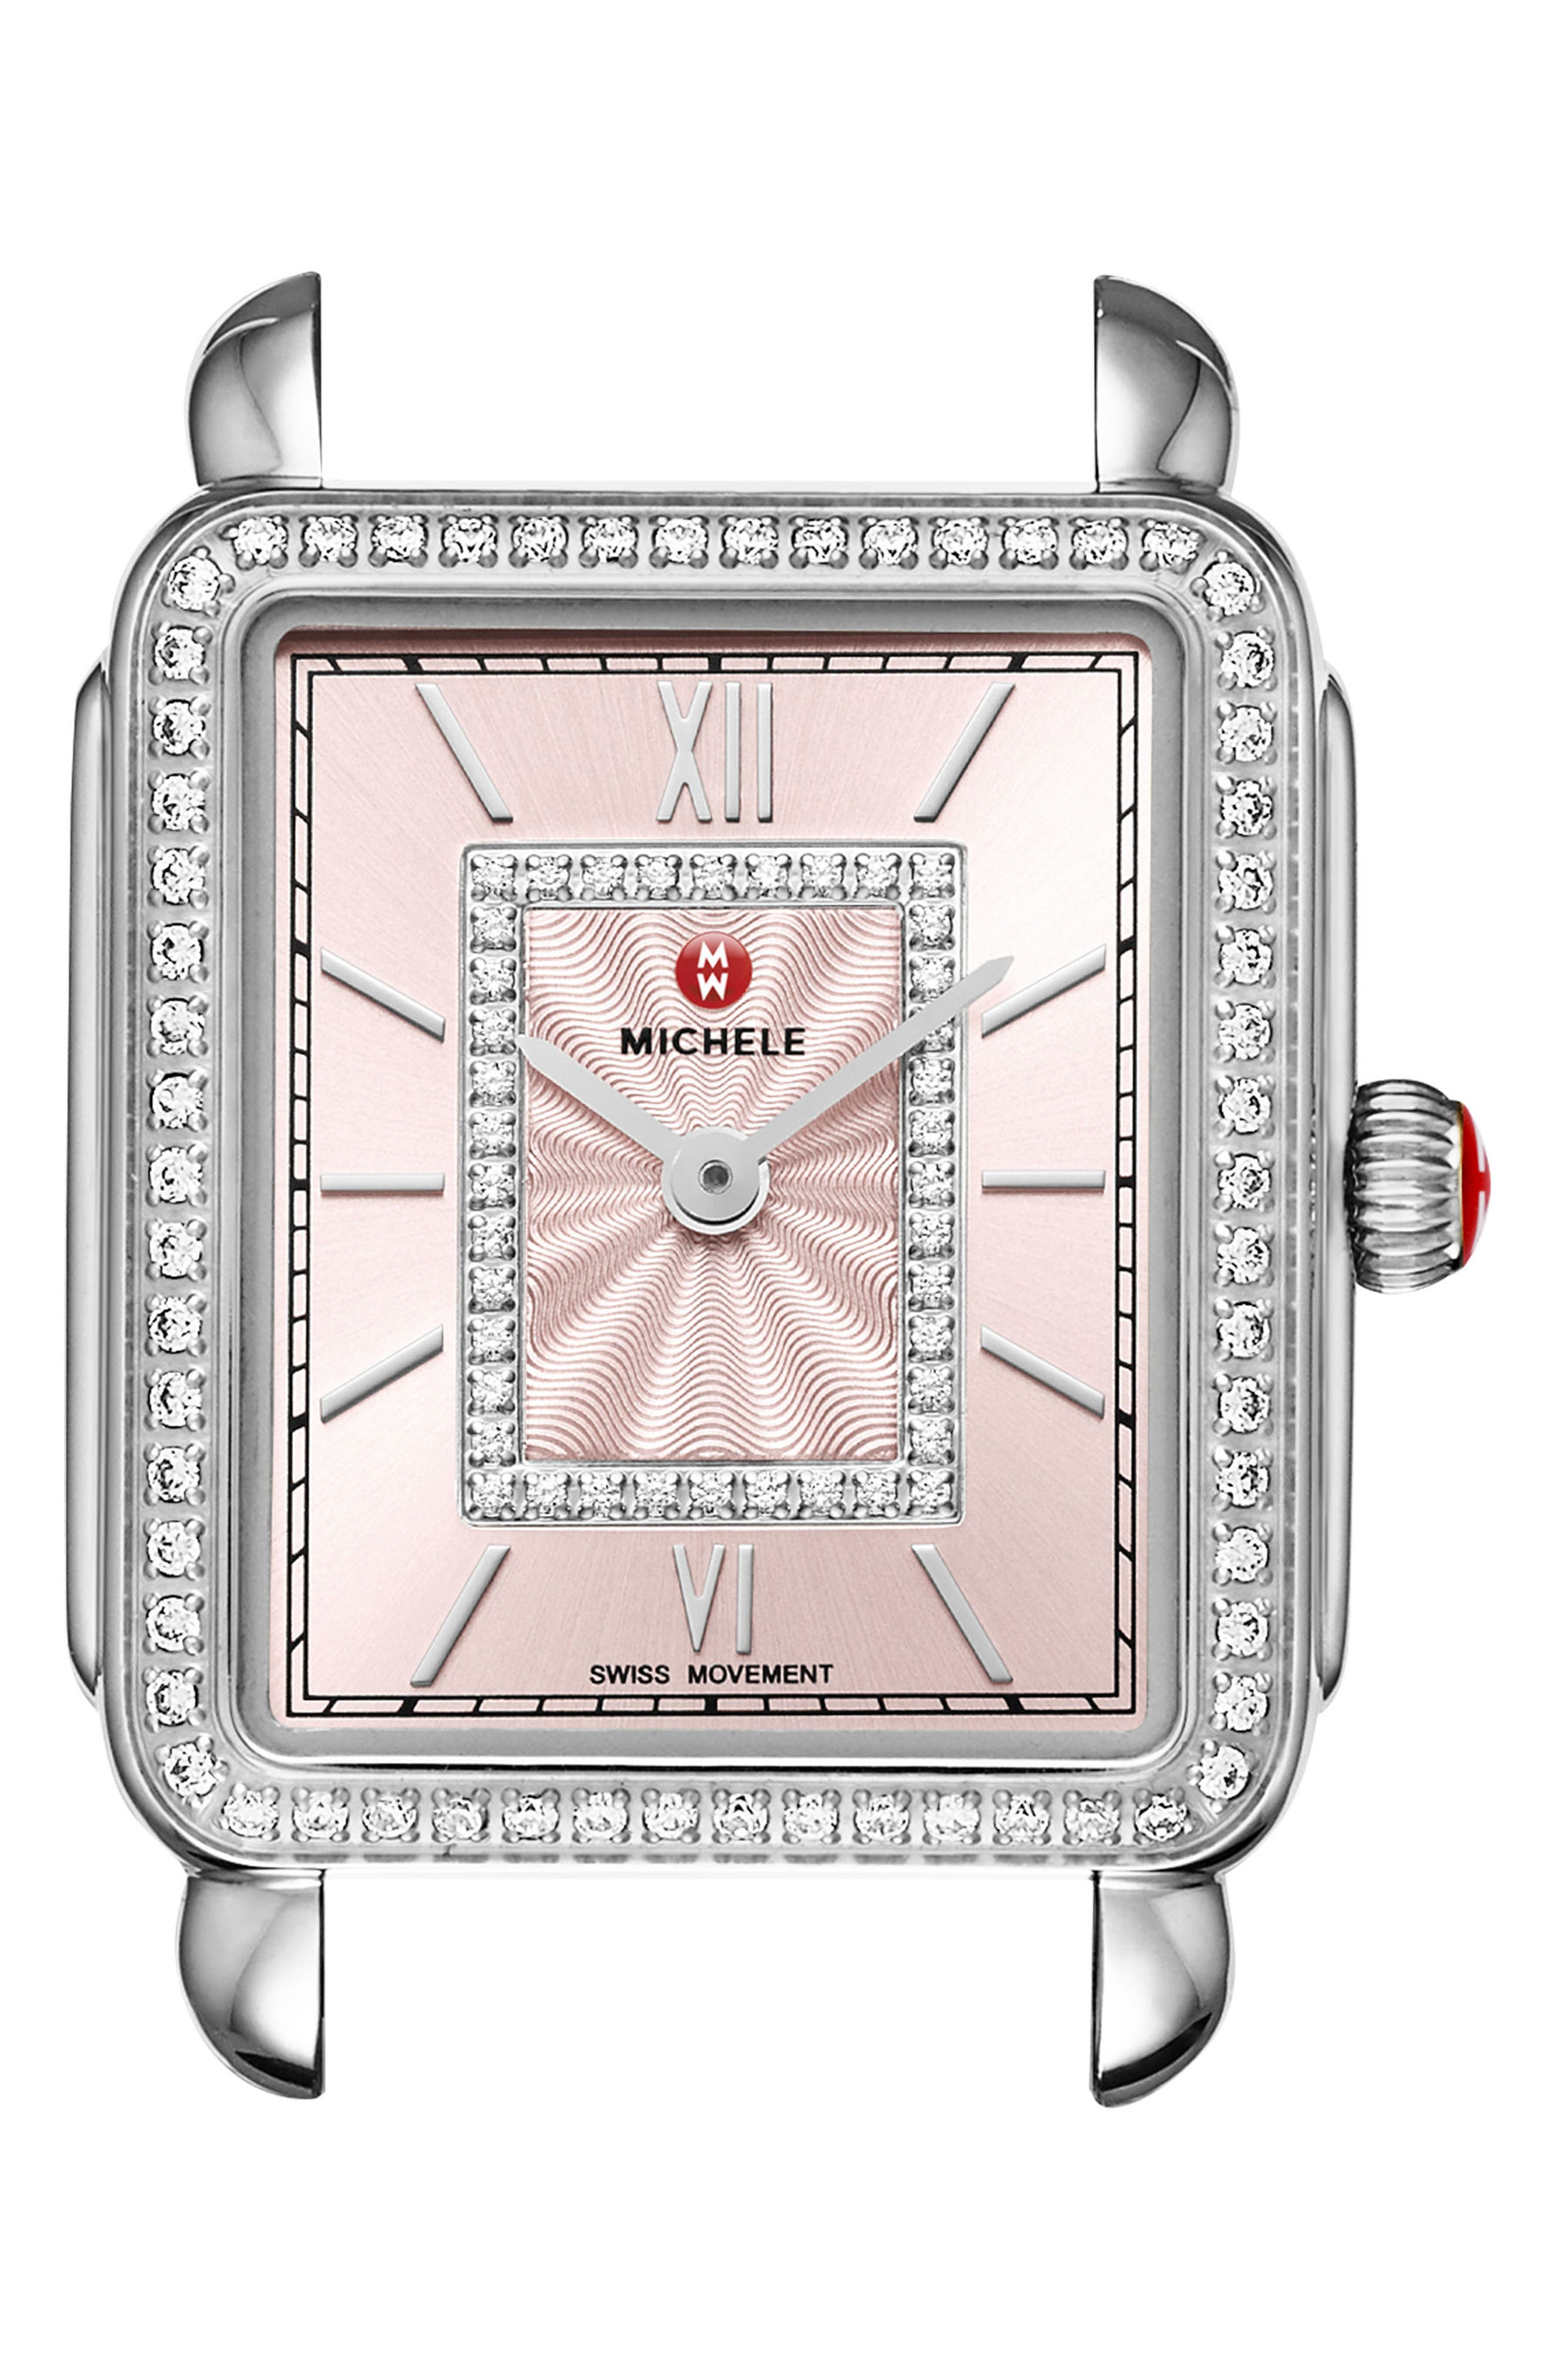 Main Image - MICHELE Deco II Mid Diamond Watch Head, 26mm x 27mm